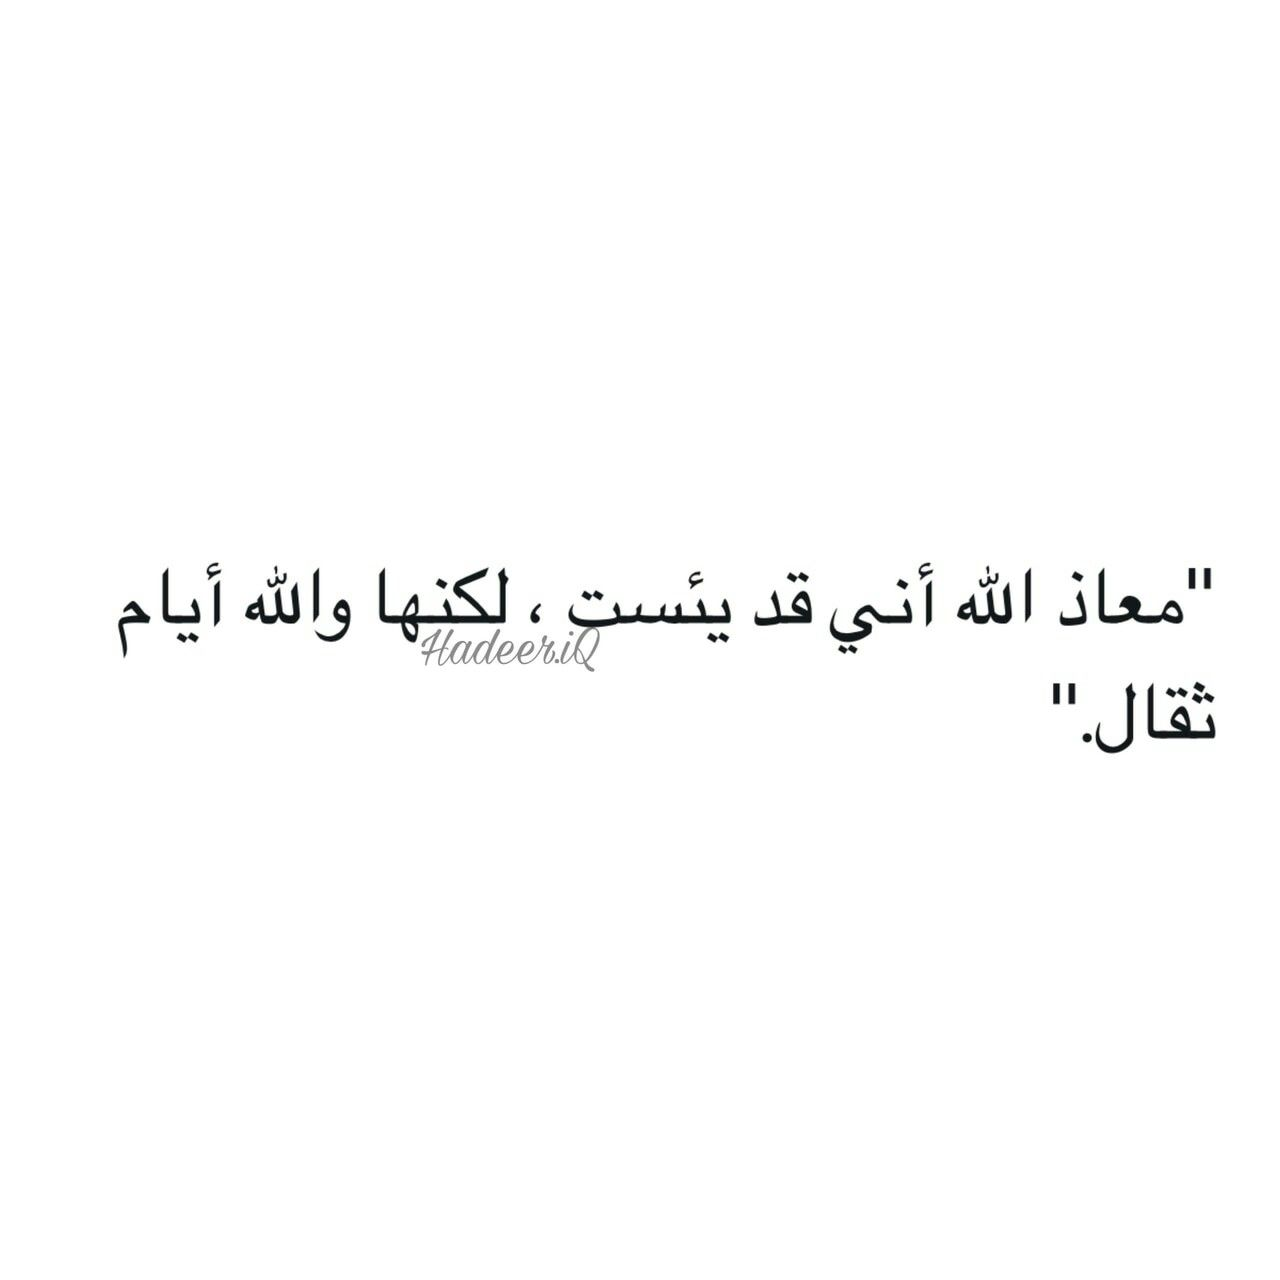 يا الله خفف عني ثقل هذه الأيام Math Arabic Calligraphy Math Equations